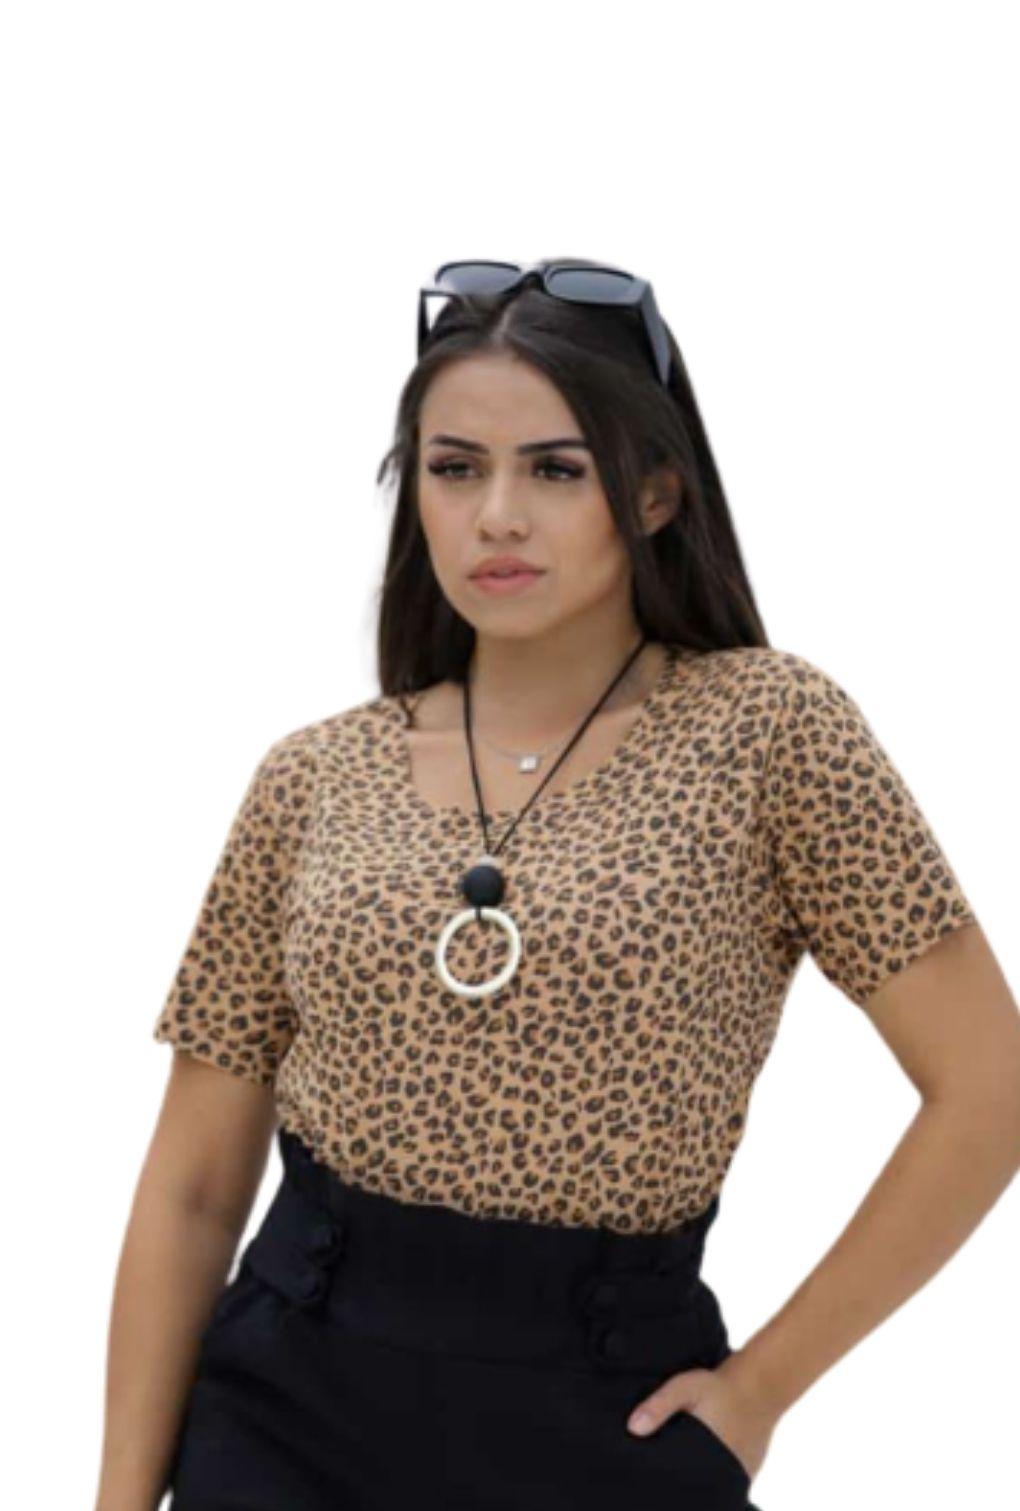 Blusa Feminina Estampada Animal Print Onça Manga Curta Em Suede  - ModaStore | Moda Feminina